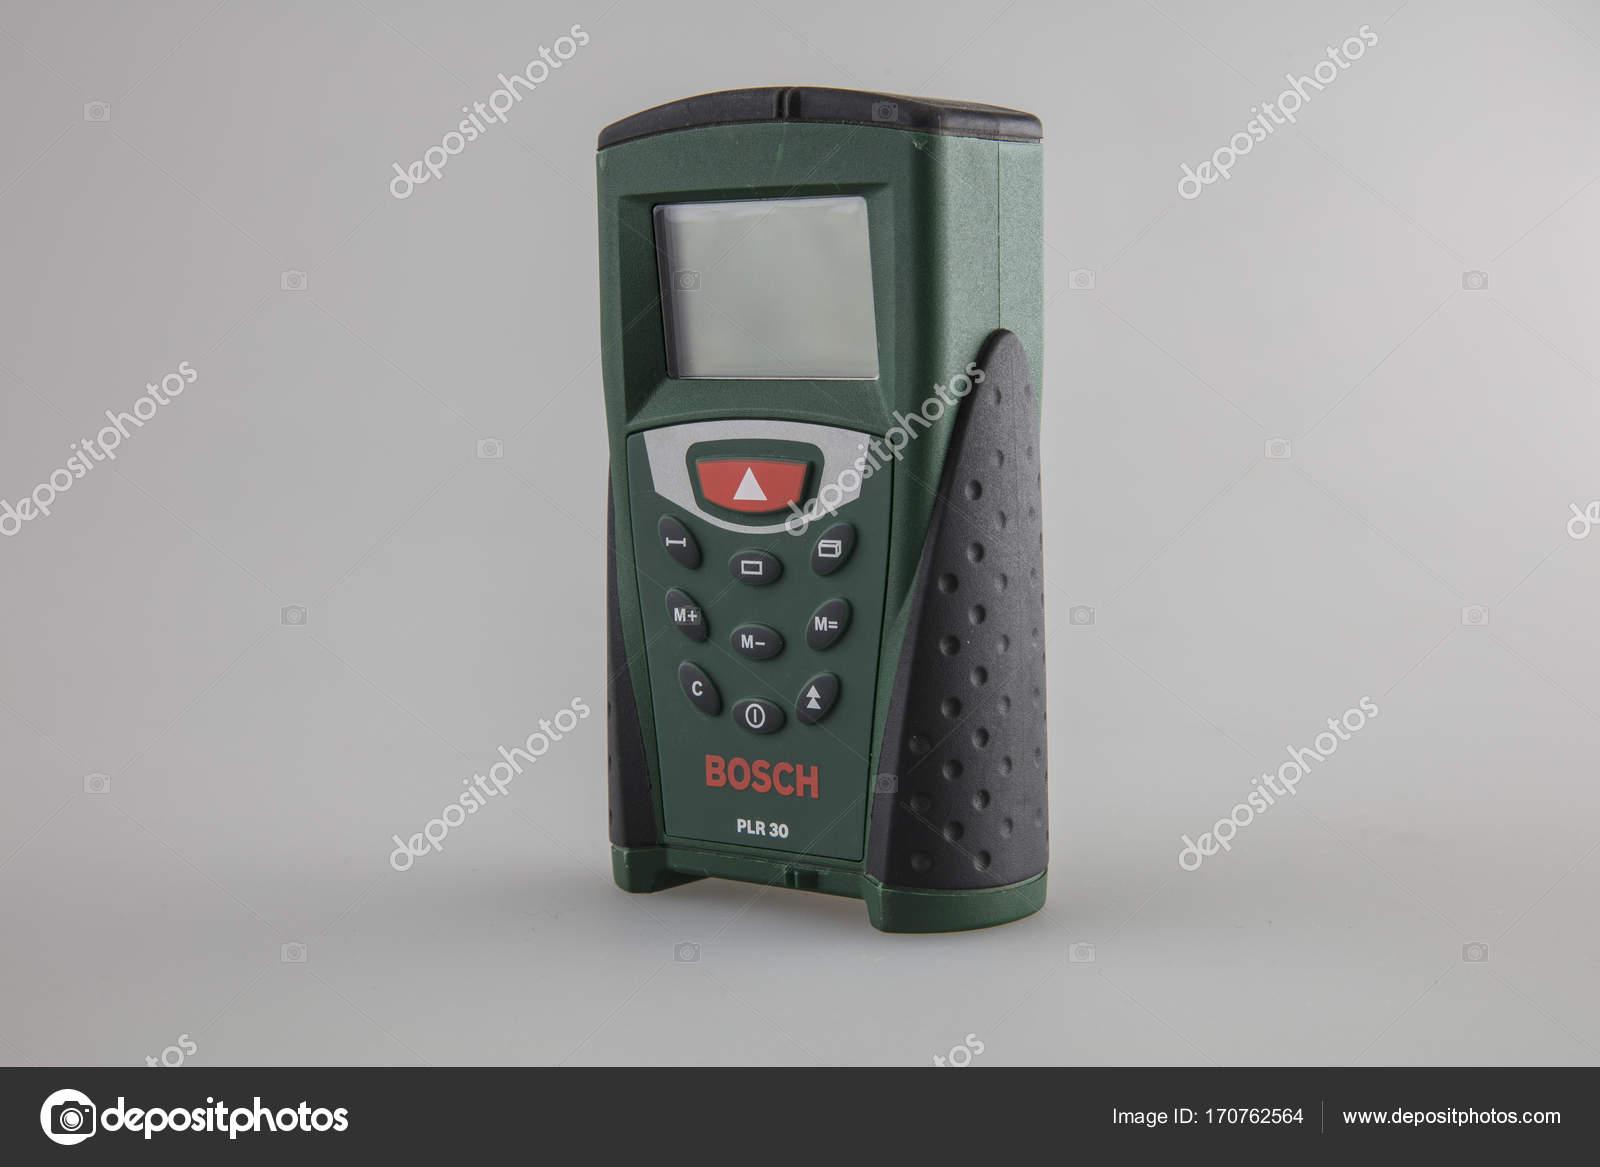 Entfernungsmesser handy: entfernungsmesser app selbst. pebble